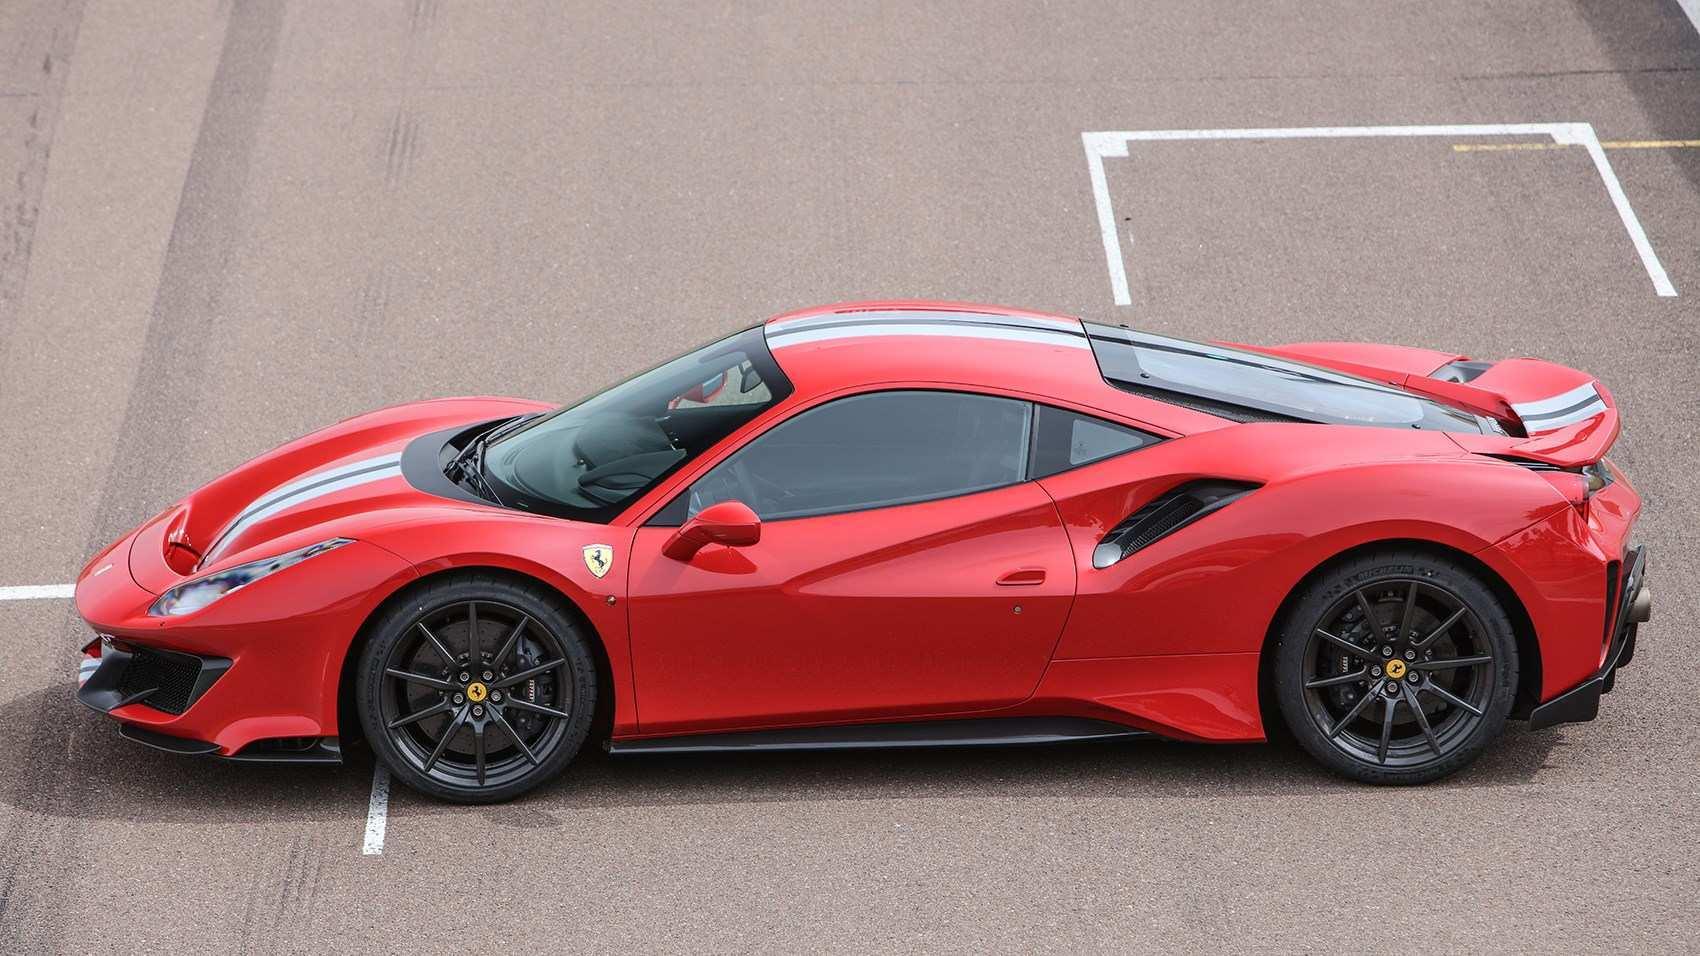 56 The 2019 Ferrari 488 Pista Price Engine by 2019 Ferrari 488 Pista Price